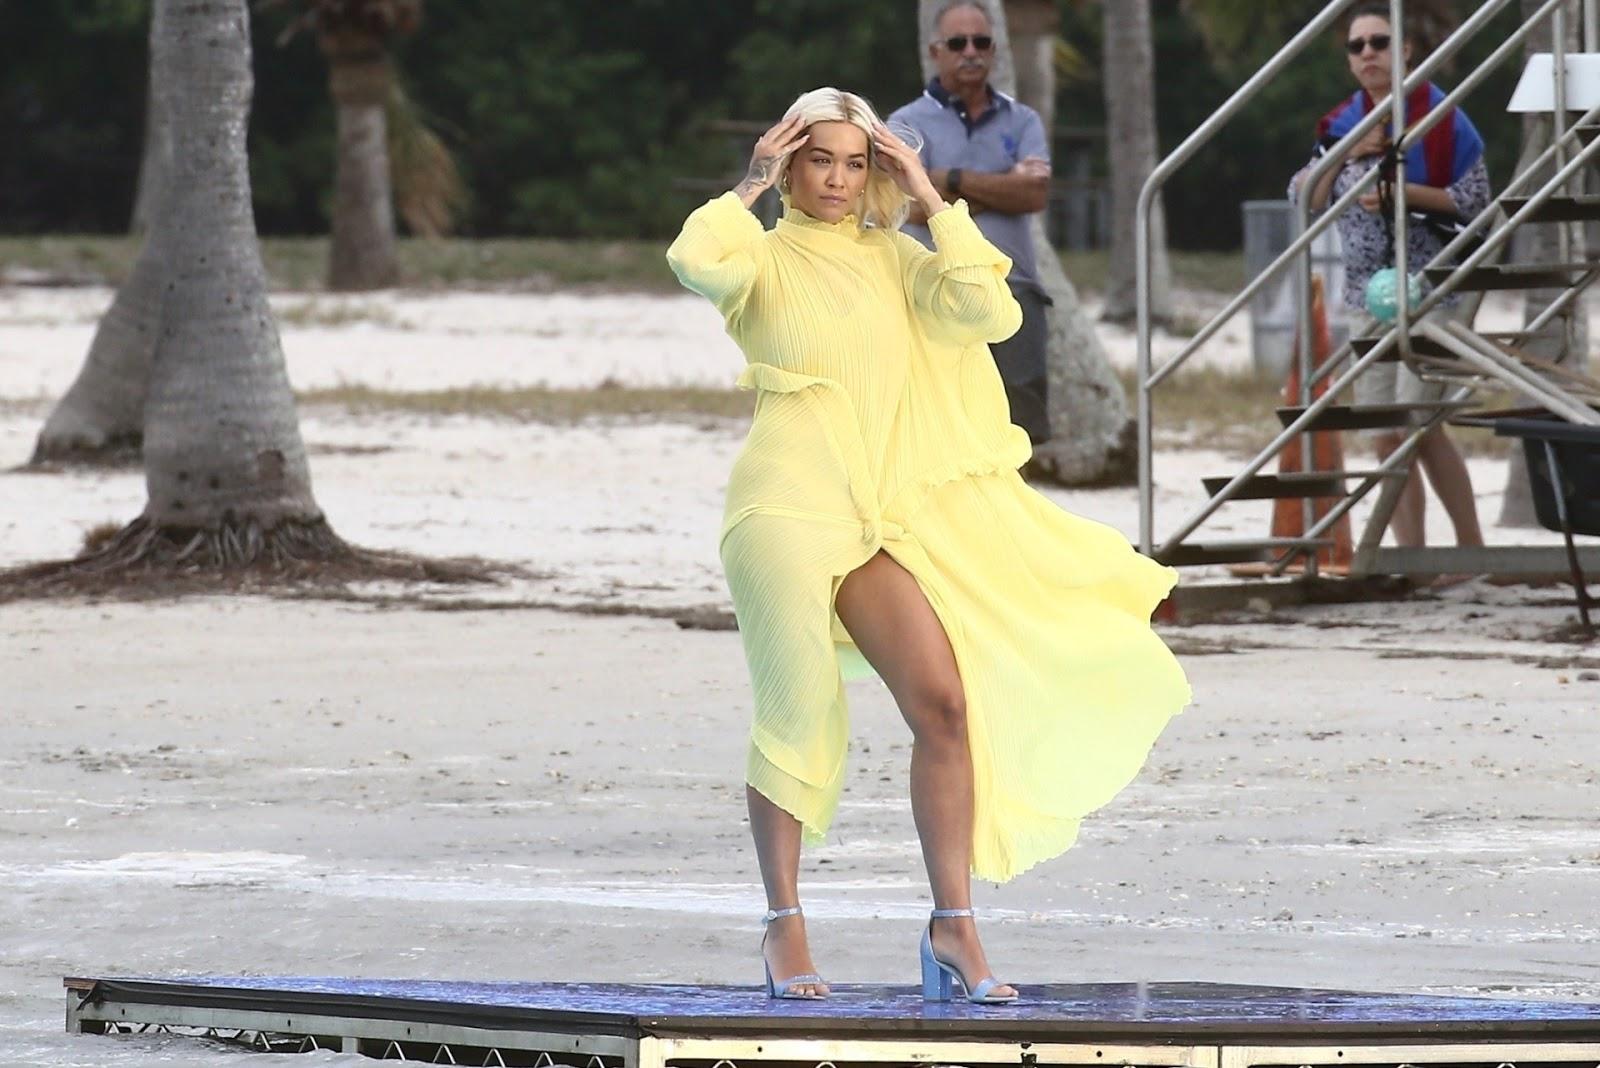 Rita ora having wardrobe malfunction exposing her panties on beach in Miami.